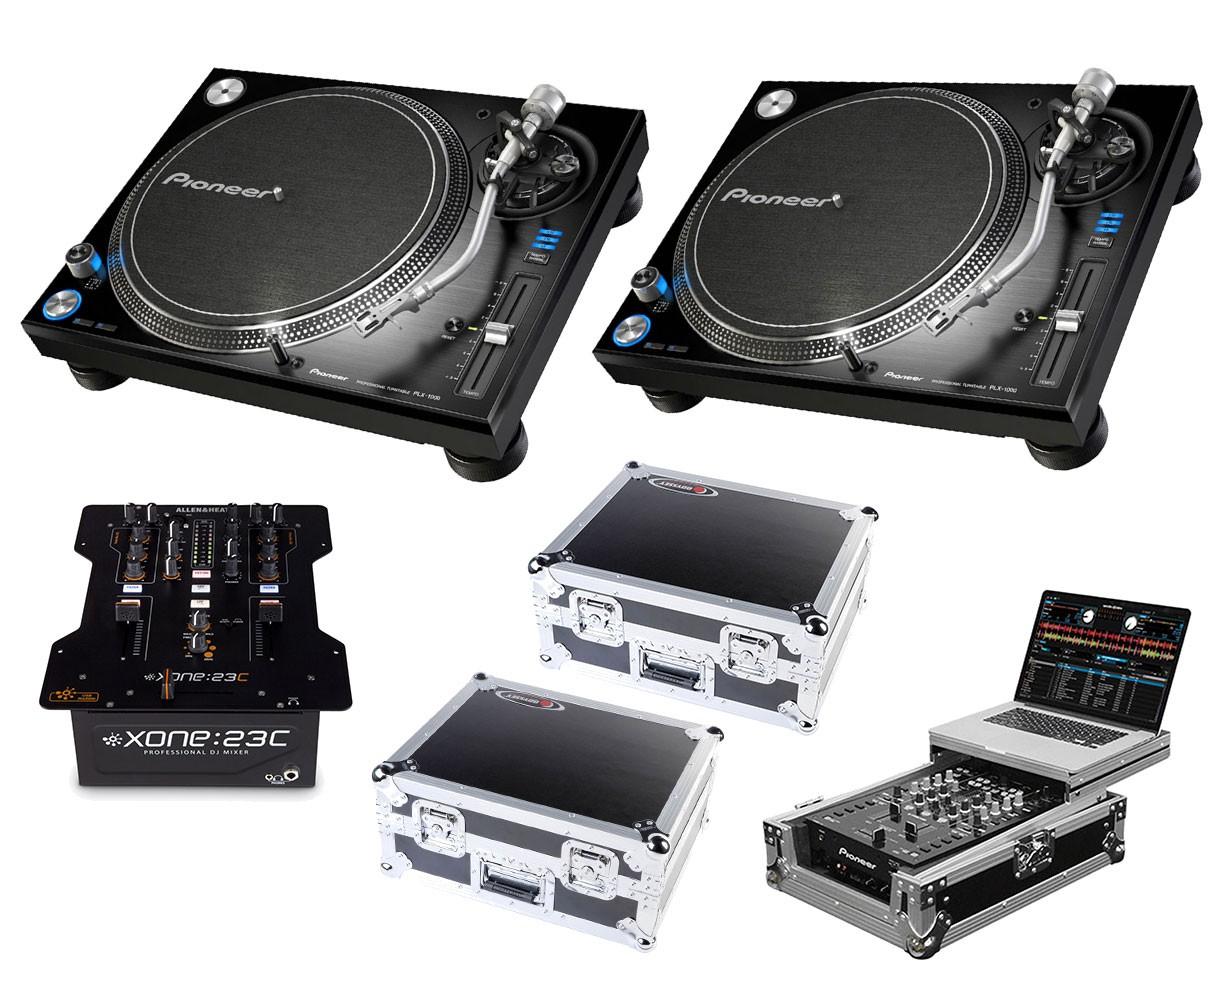 2x Pioneer PLX-1000 + Xone:23C + Odyssey Cases + Glide Style Case